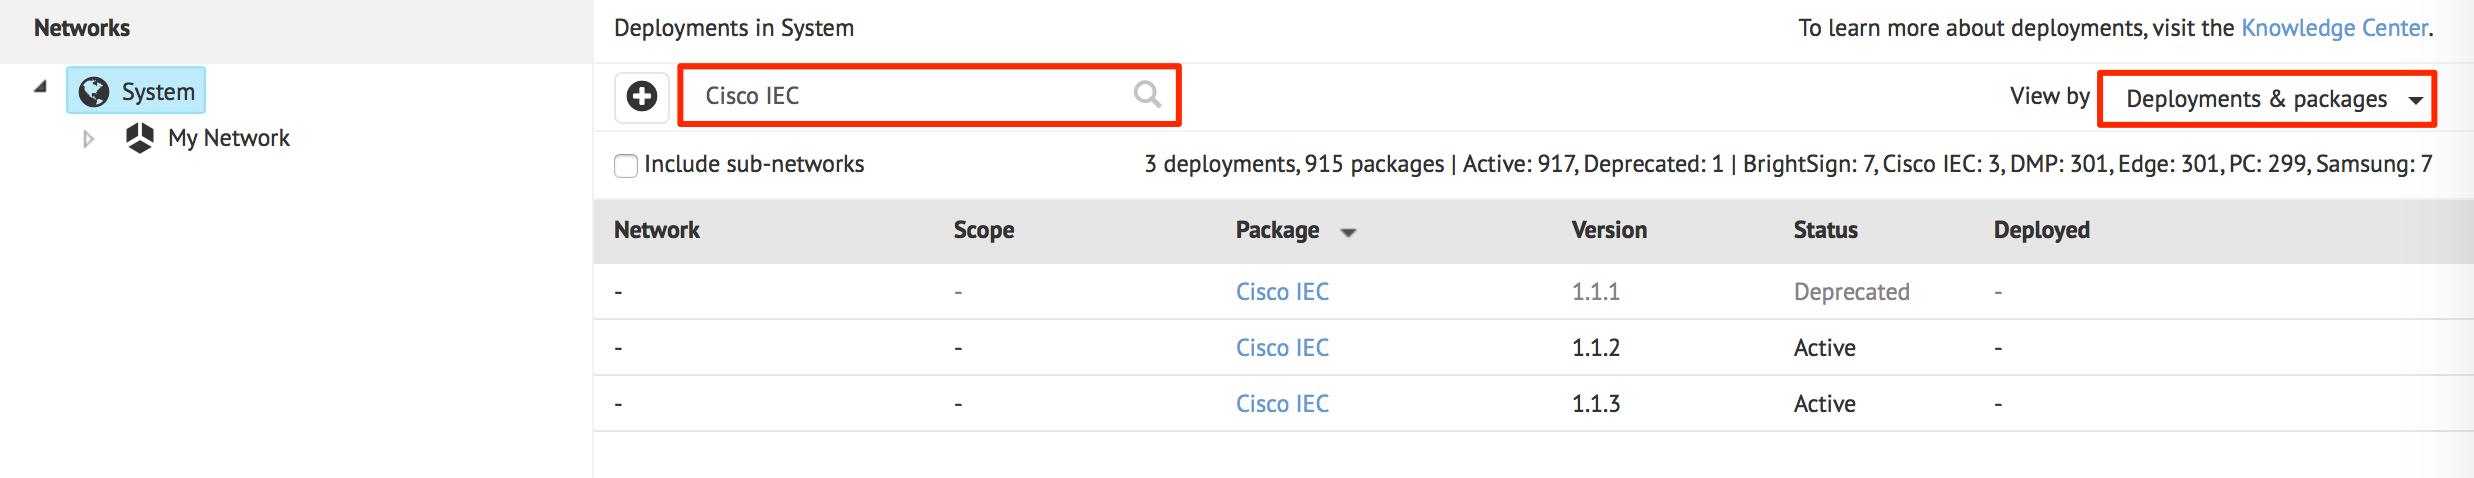 Configure Chrome OS devices with Chrome Enterprise (CDM